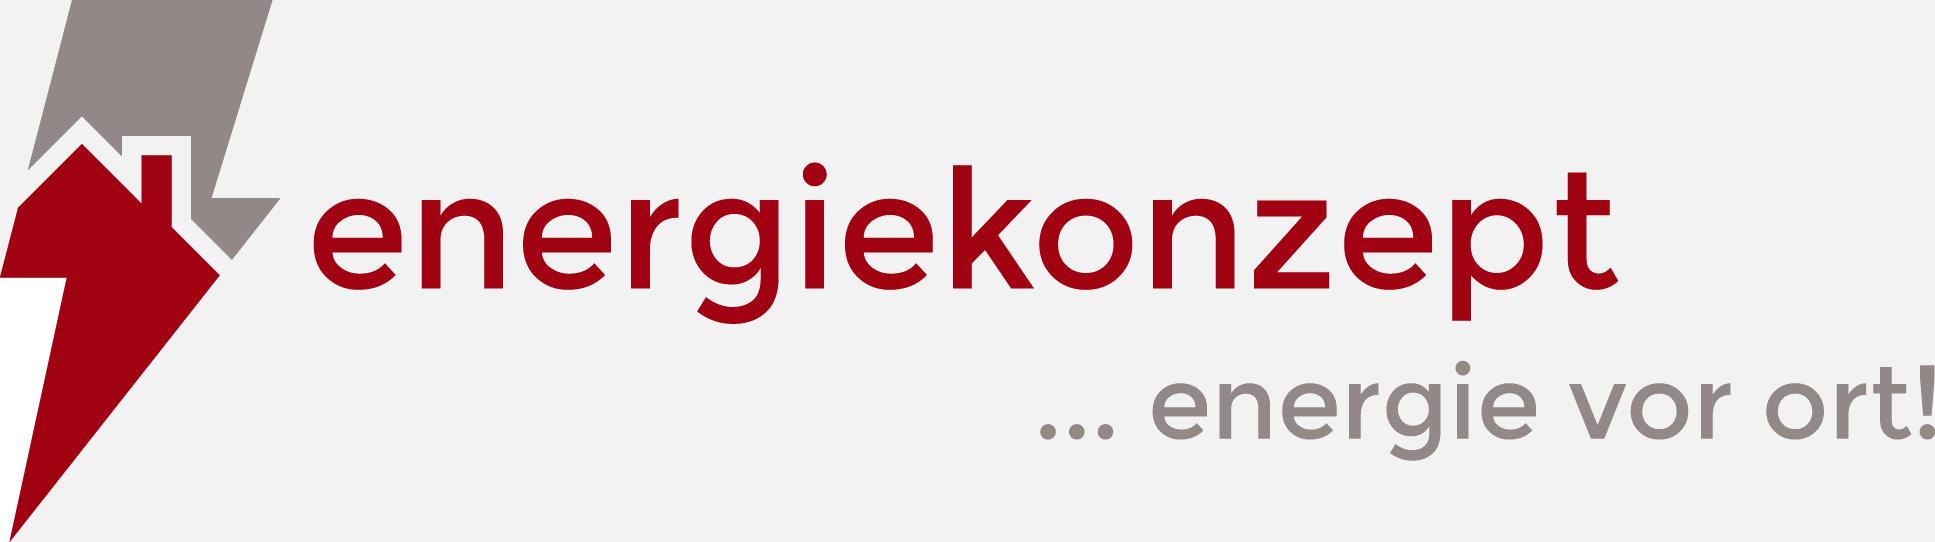 Energiekonzept-Logo